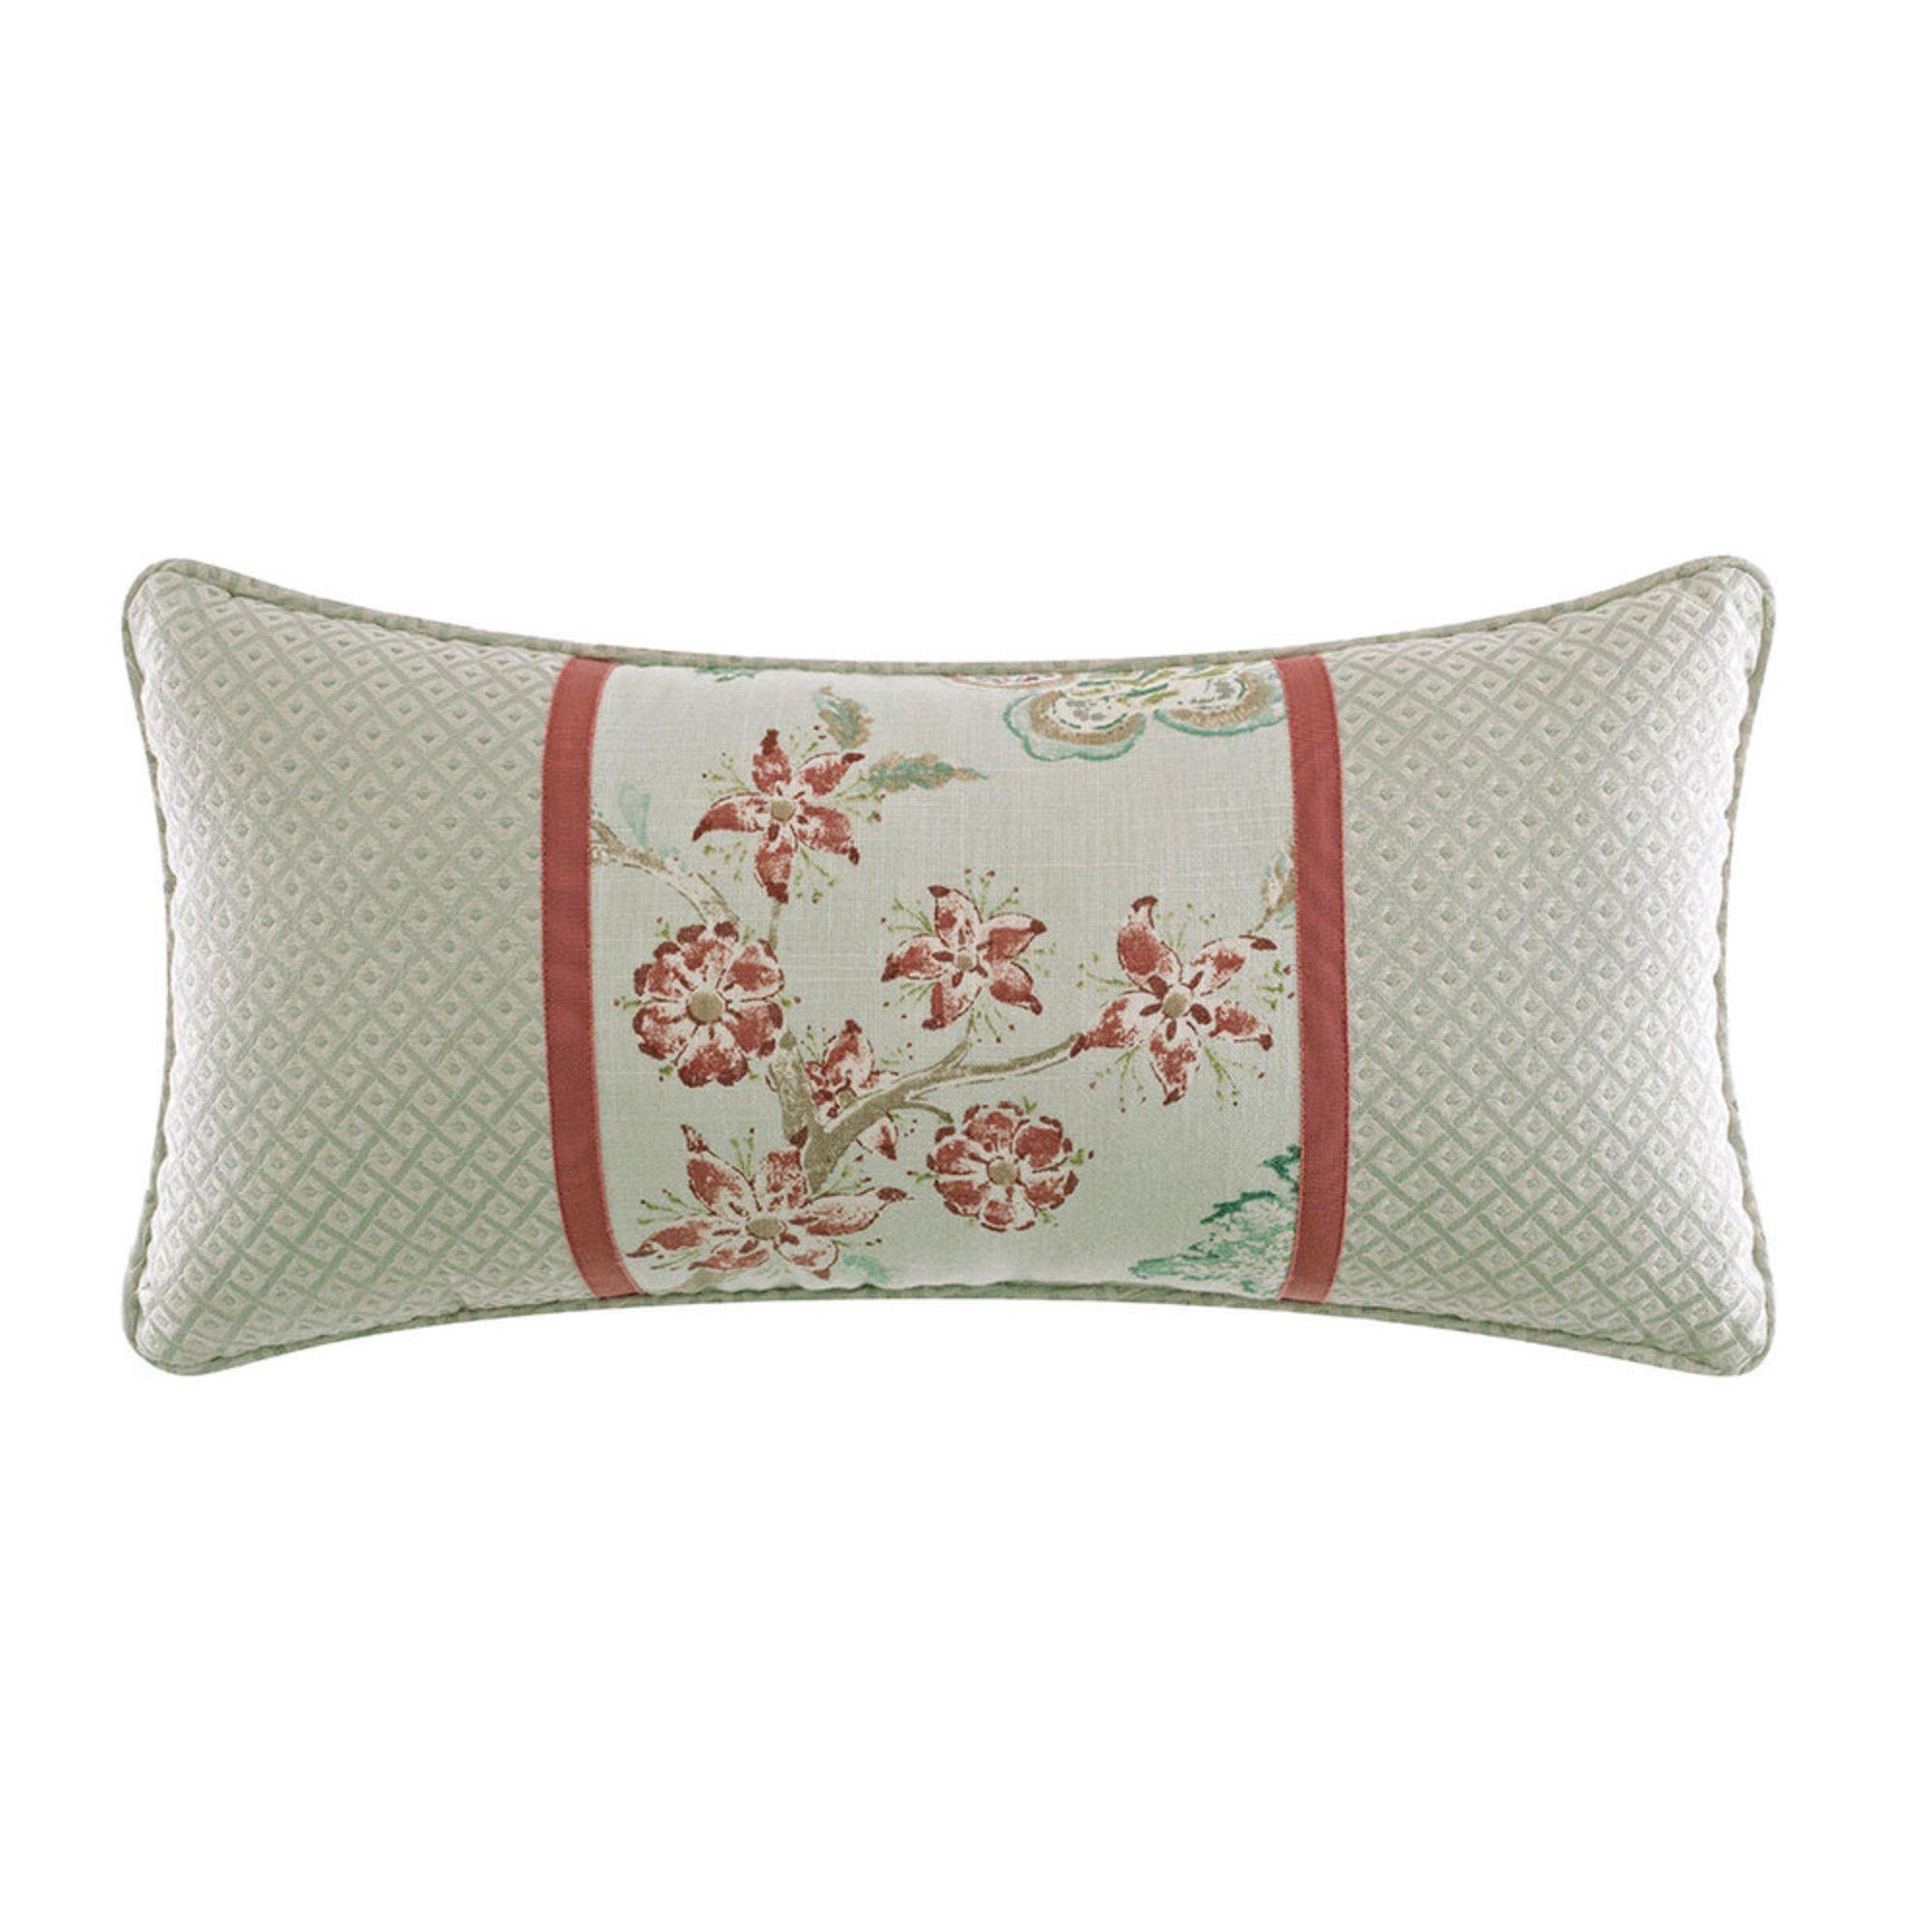 Decorative Pillows Outlet : Croscill Retreat 22x11 Boudoir Pillow Decorative Pillows For The Home - Shop Your Navy ...